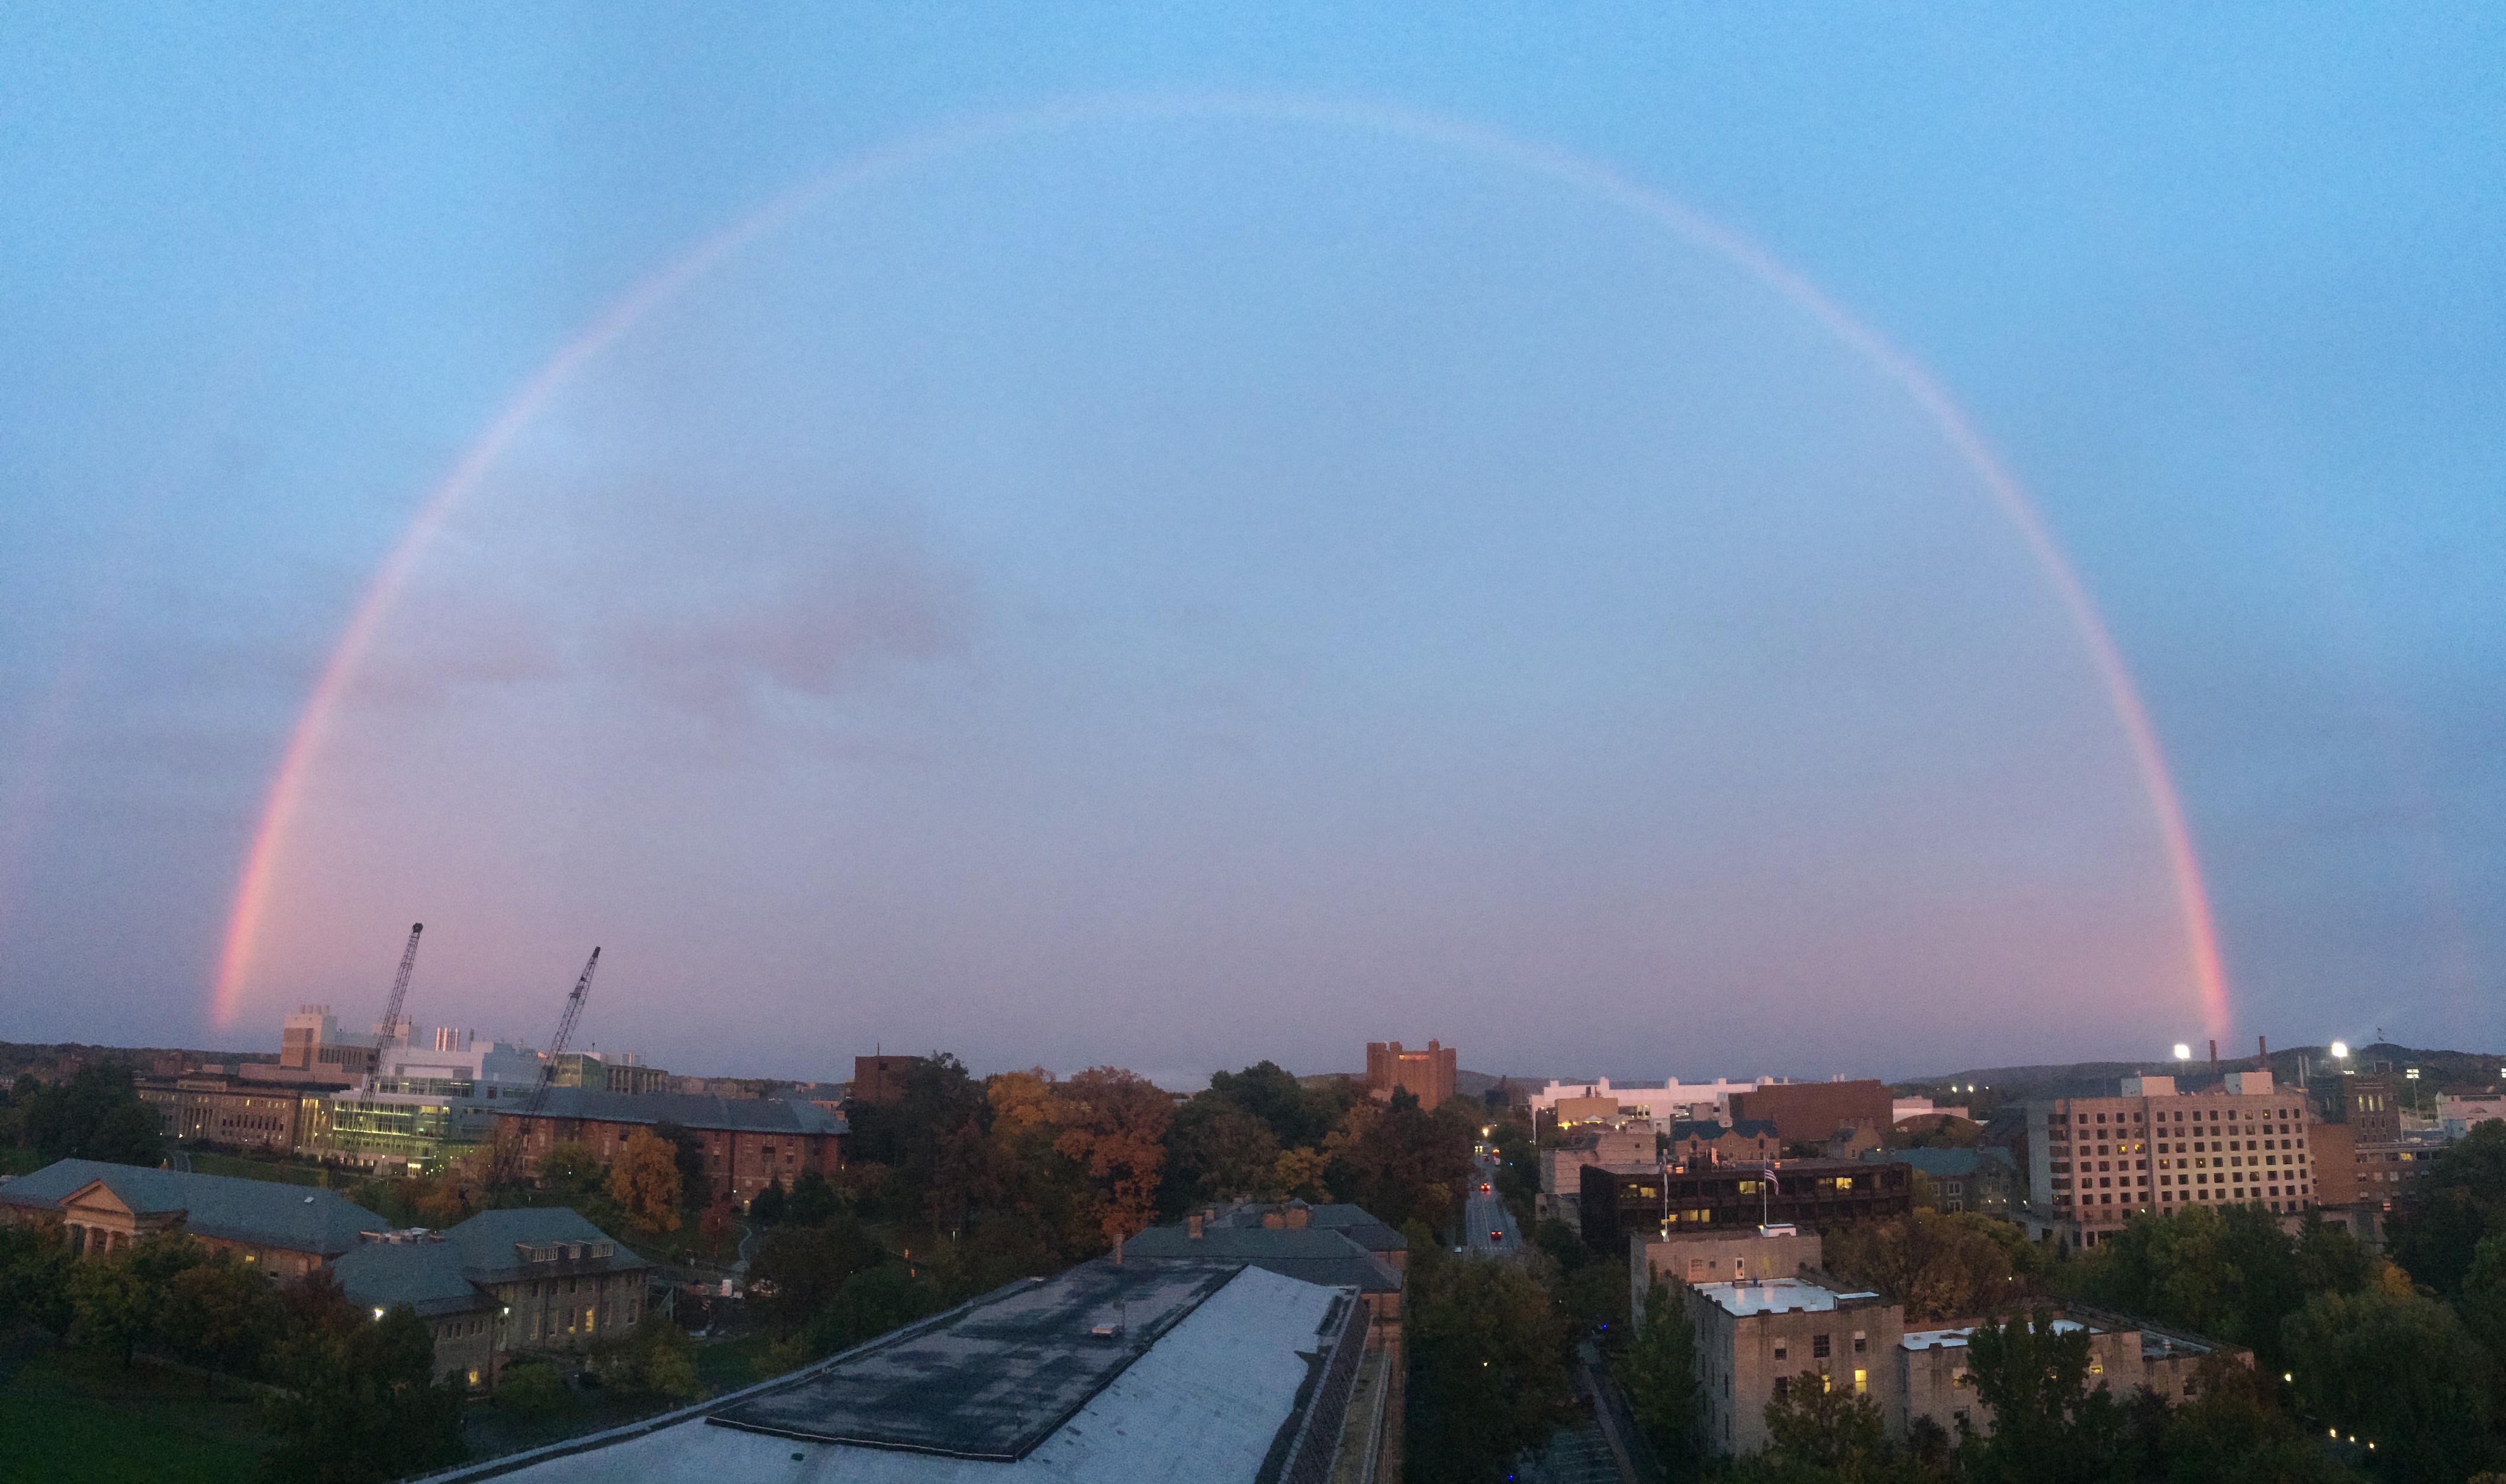 Rainbow over campus